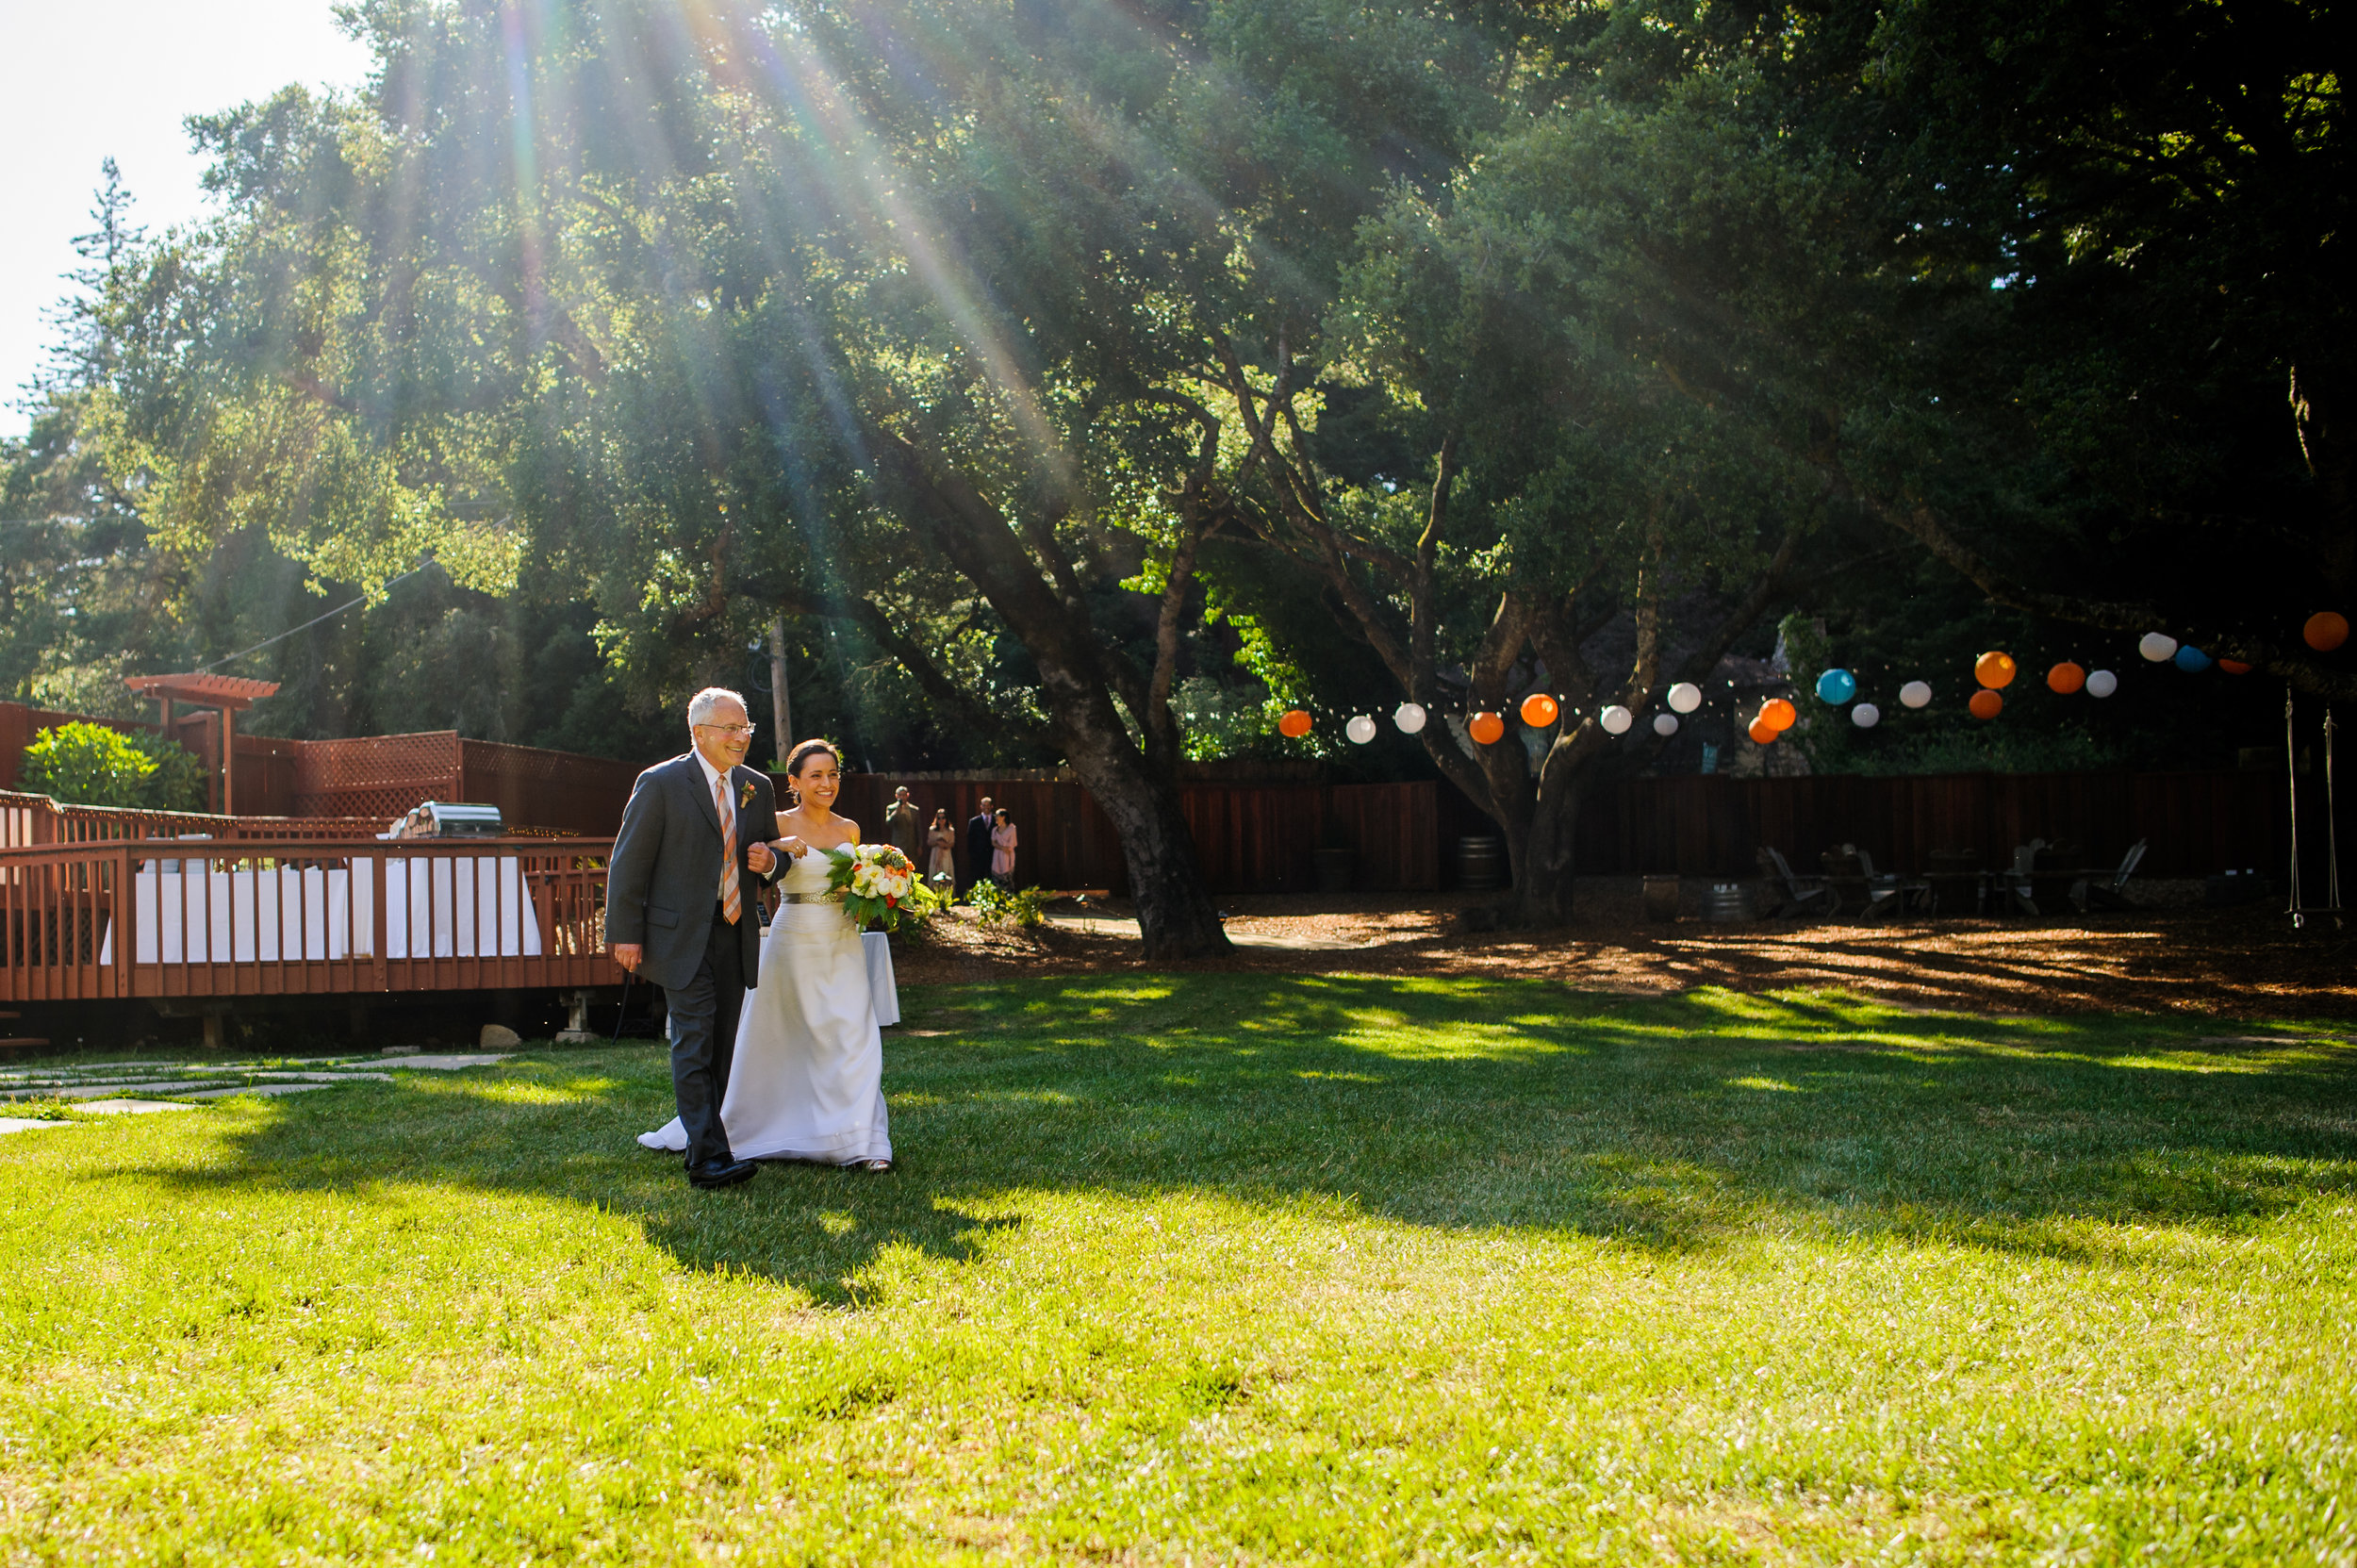 janet-jeremy-016-mountain-terrace-woodside-wedding-photographer-katherine-nicole-photography.JPG